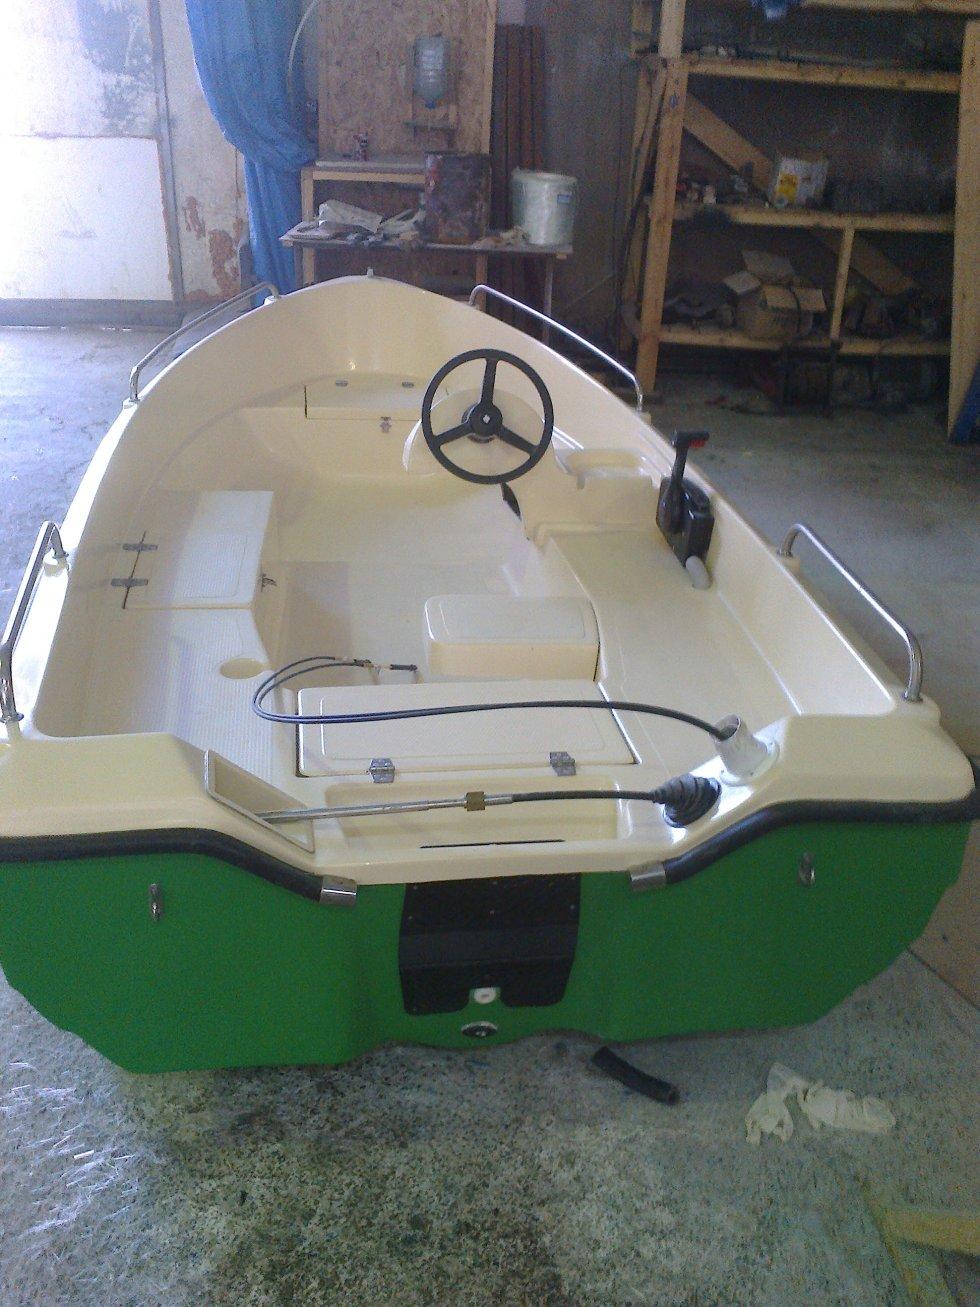 купить лодку пвх кайман 360 в москве